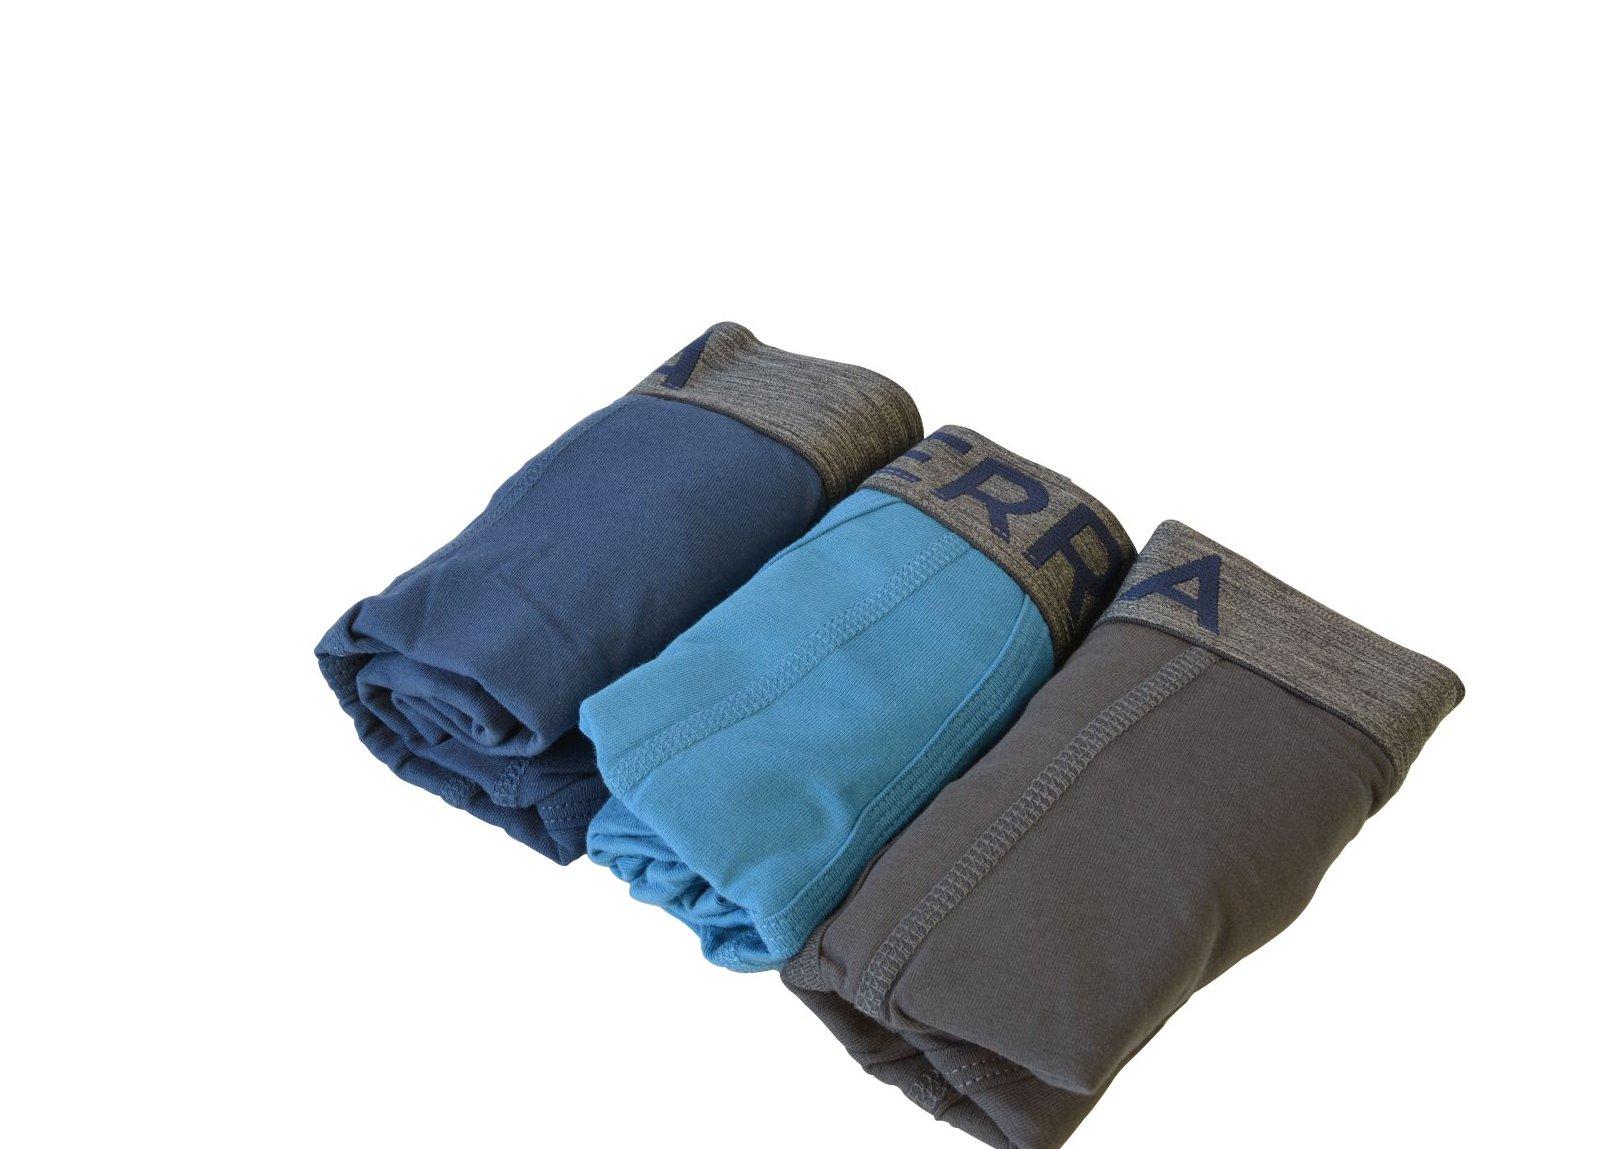 Terra Men\'s Cotton Classic Stretch Boxer Brief, Assorted Underwear, 3-Pack, Black/Grey Light Blue/Grey Dark Blue/Grey, X-Large